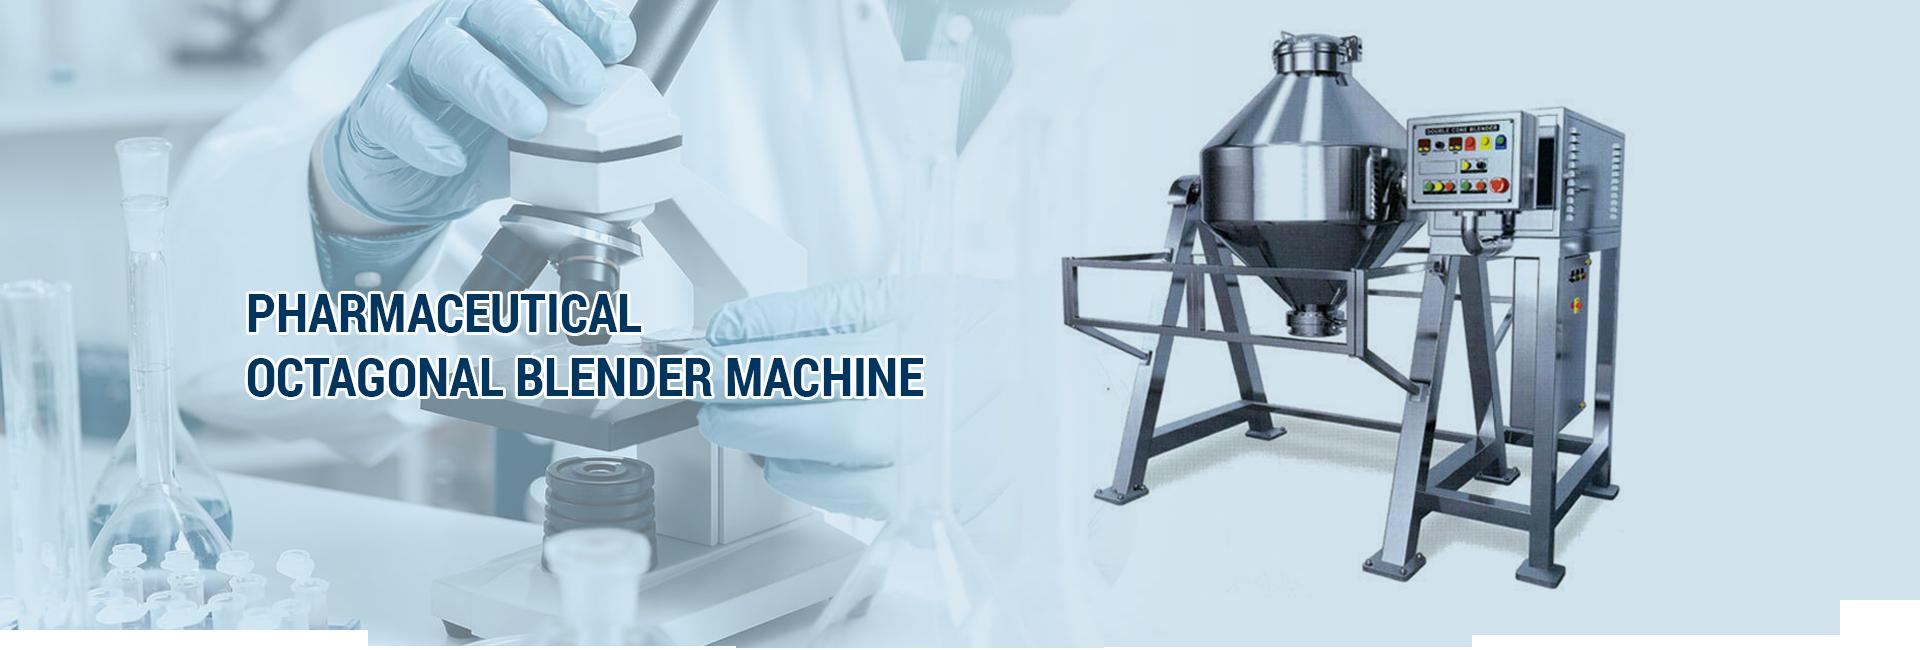 Pharmaceutical Machinery Manufacturer in India, Mumbai, Bangalore